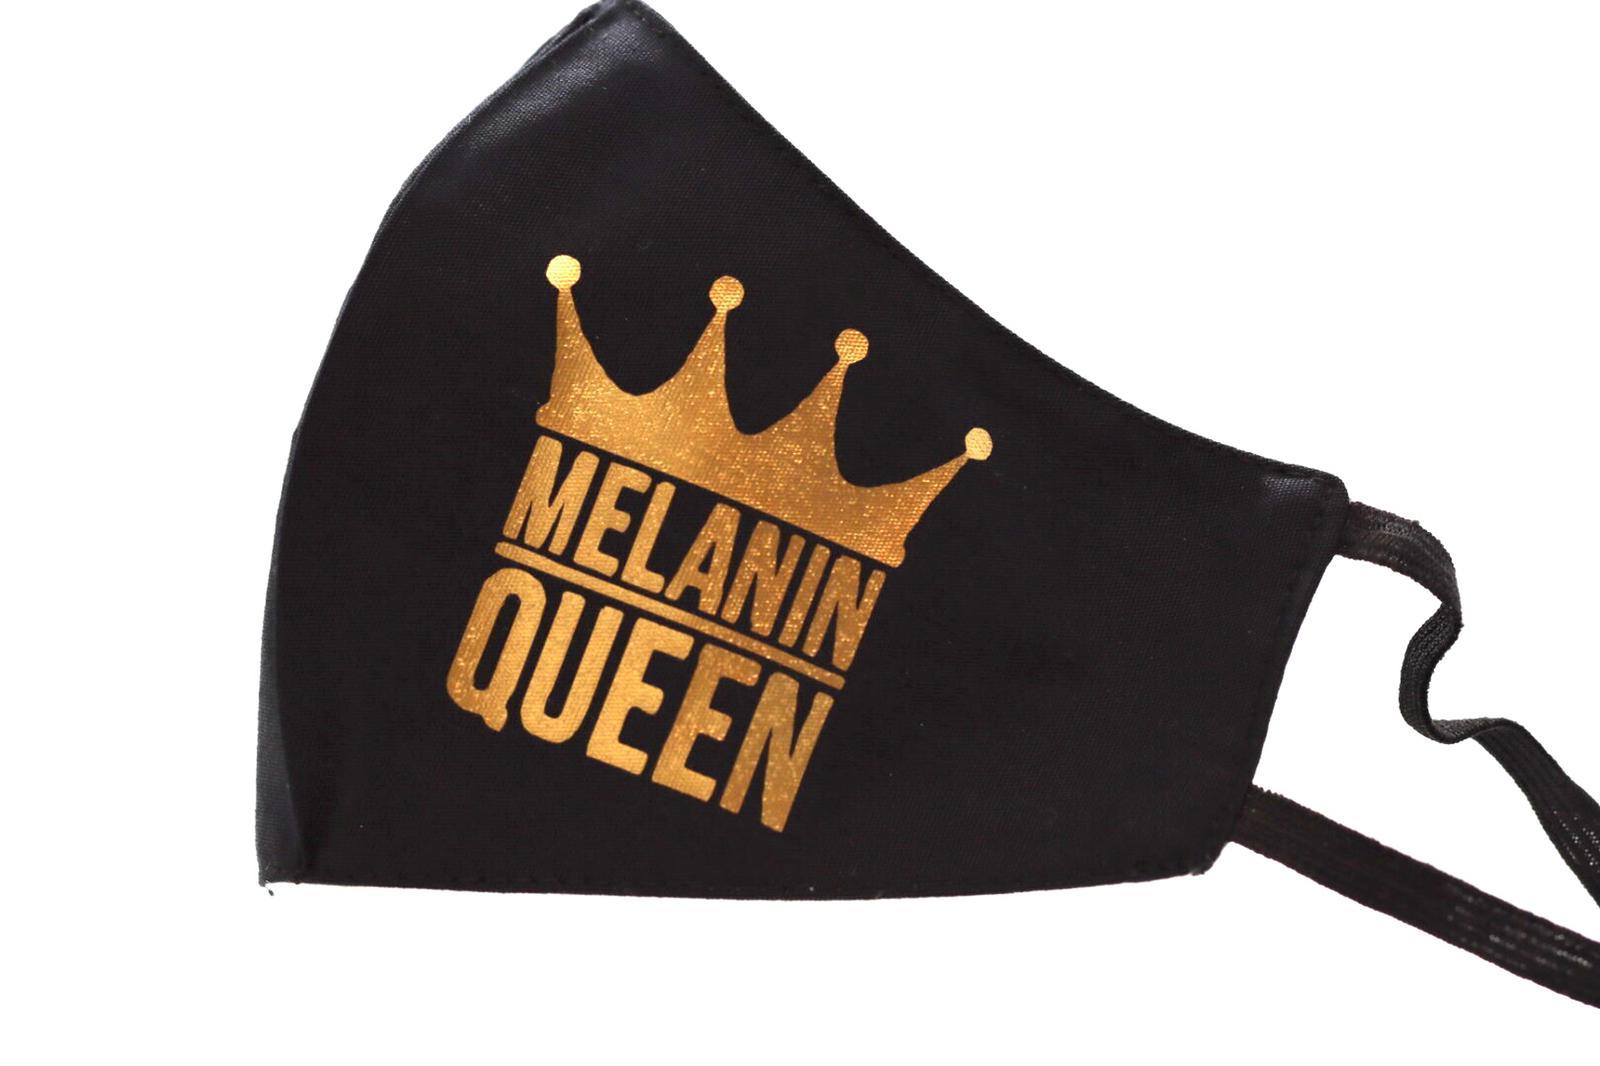 Gold Heat printed Melanin Queen Mask Kind Shop 2